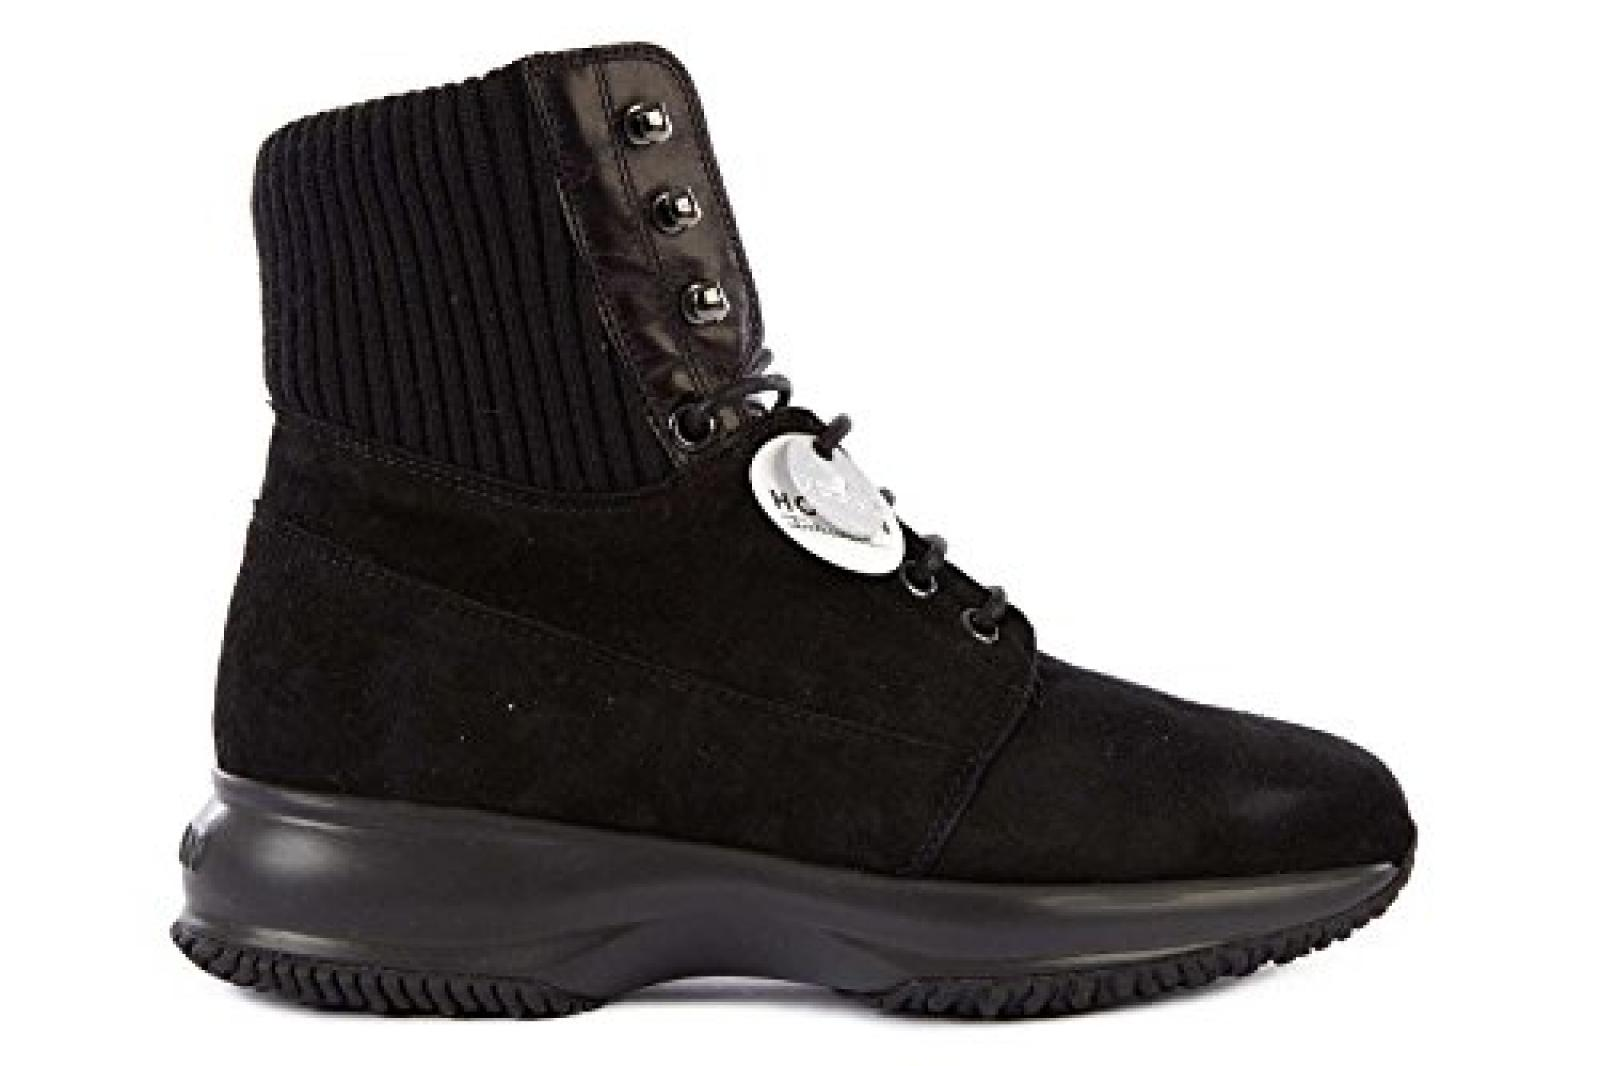 Hogan Damenschuhe Turnschuhe Damen Wildleder Schuhe Sneakers interactive Schwarz